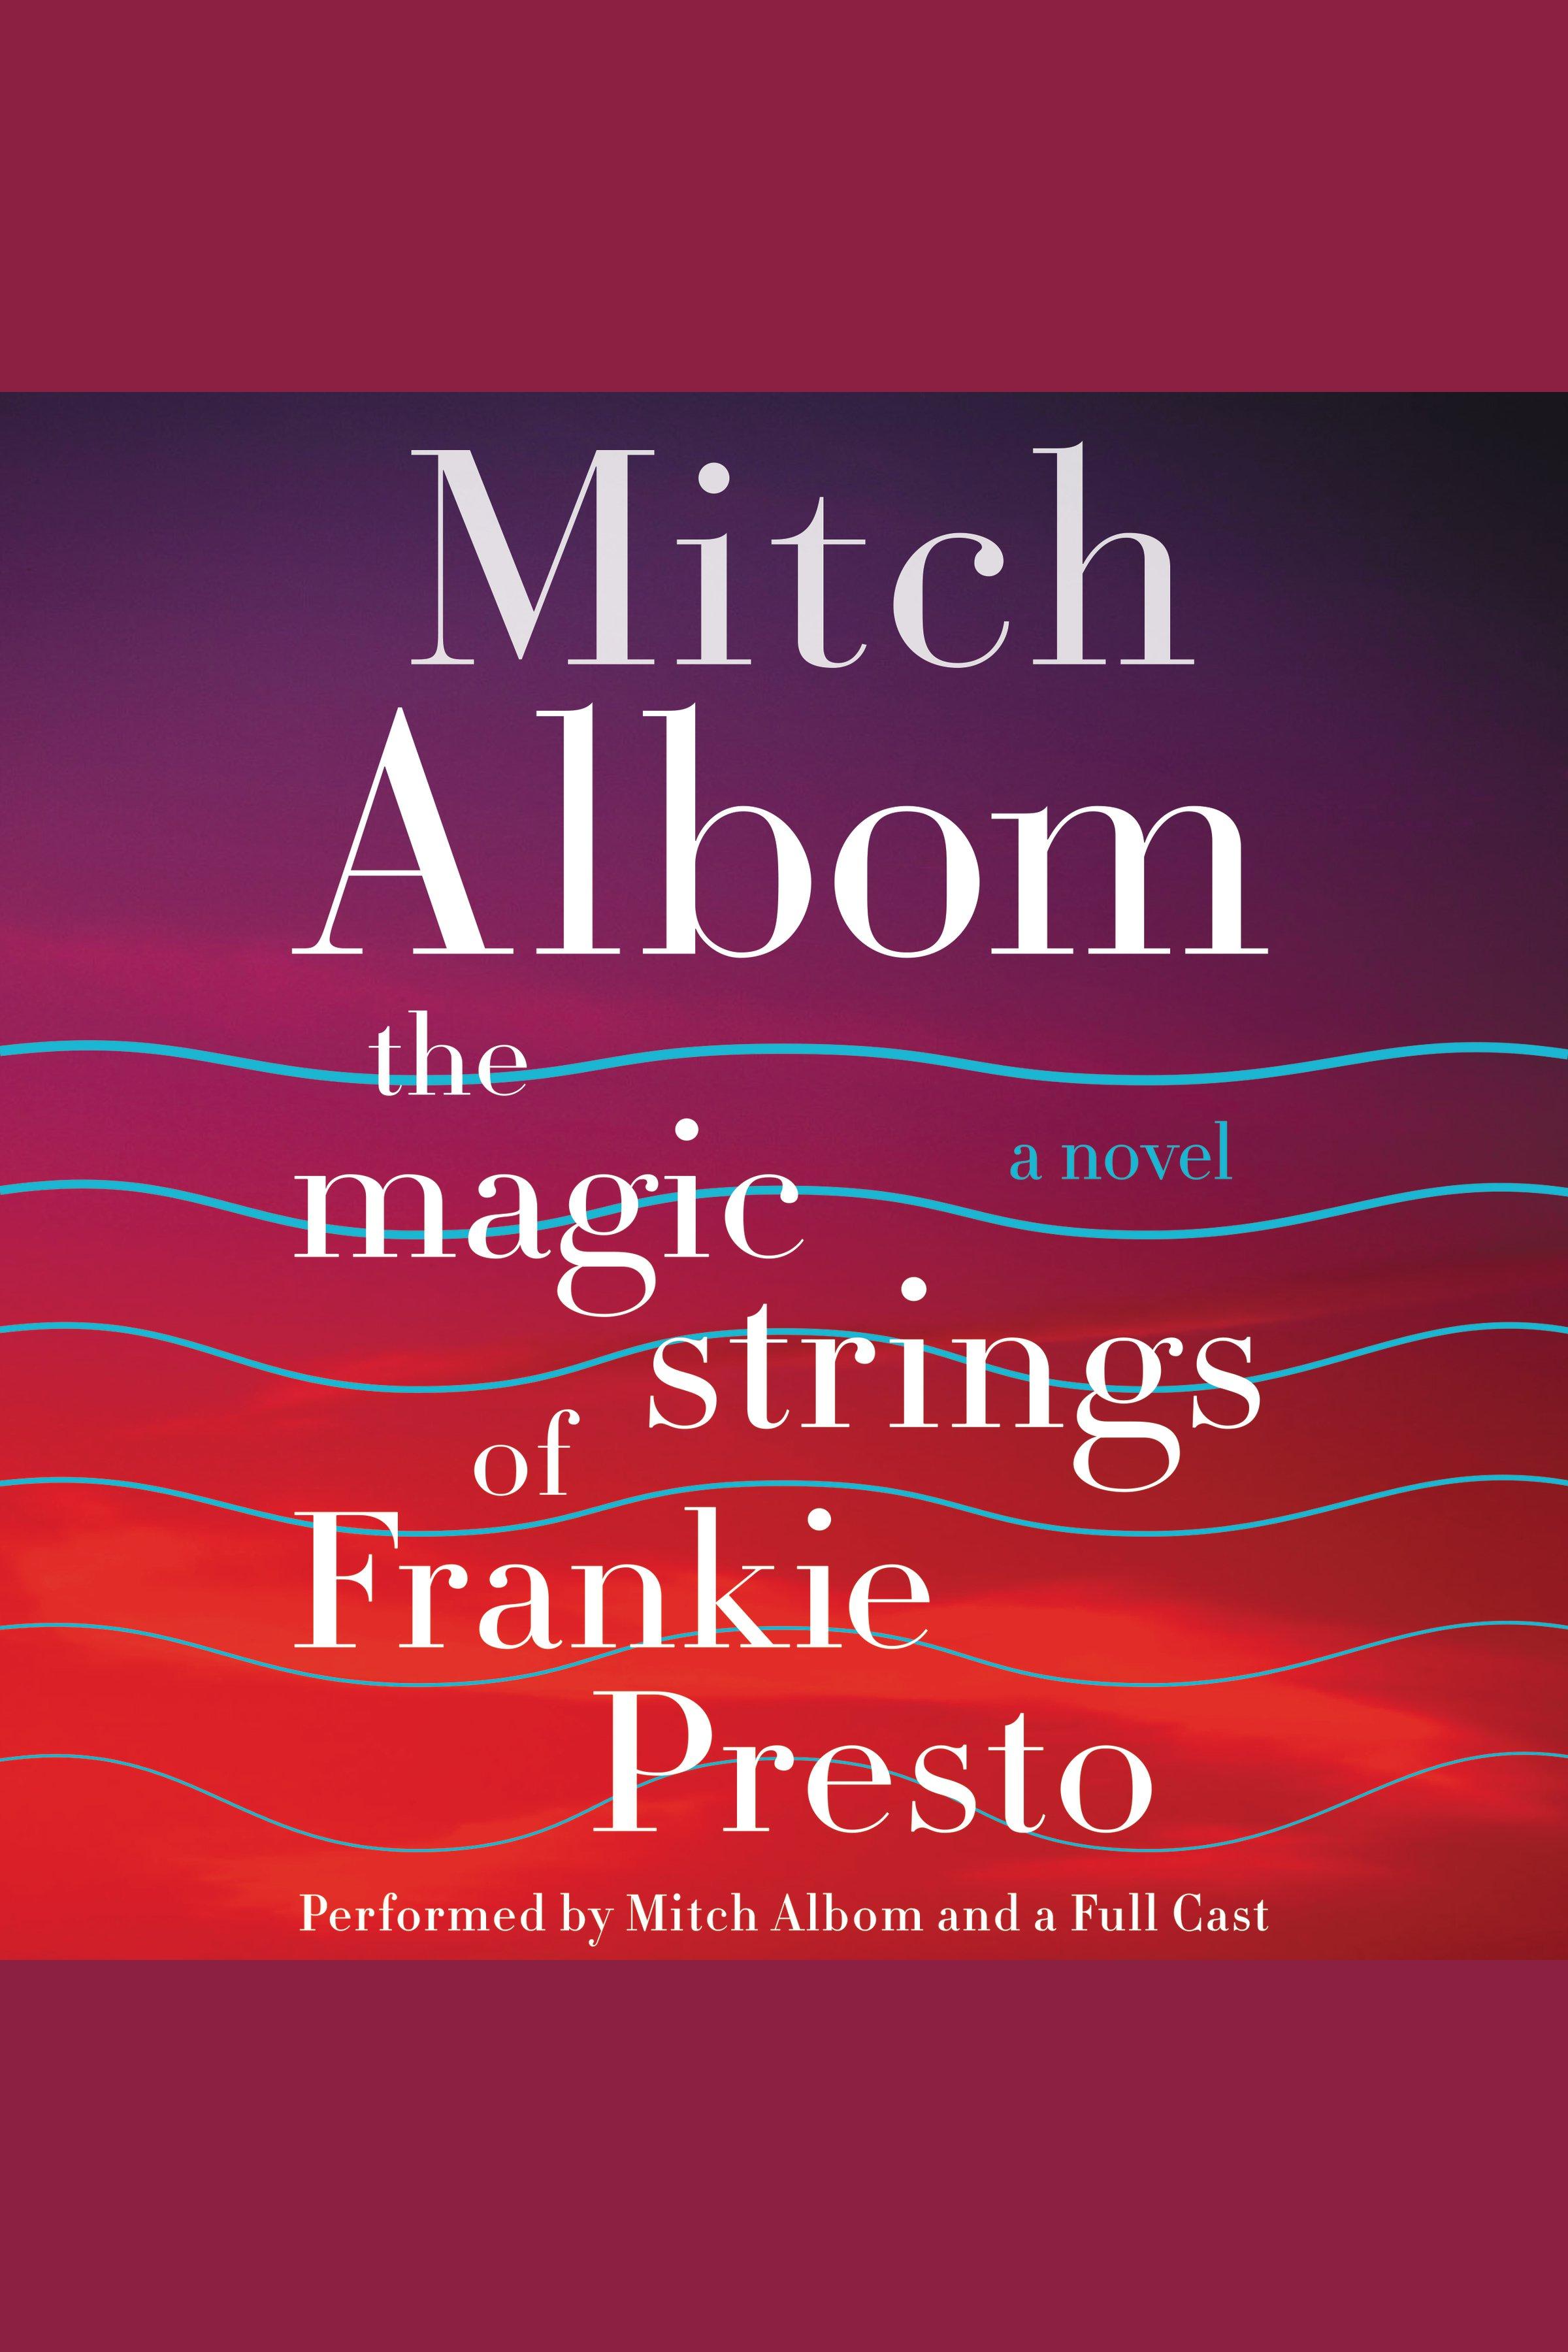 The Magic Strings of Frankie Presto A Novel